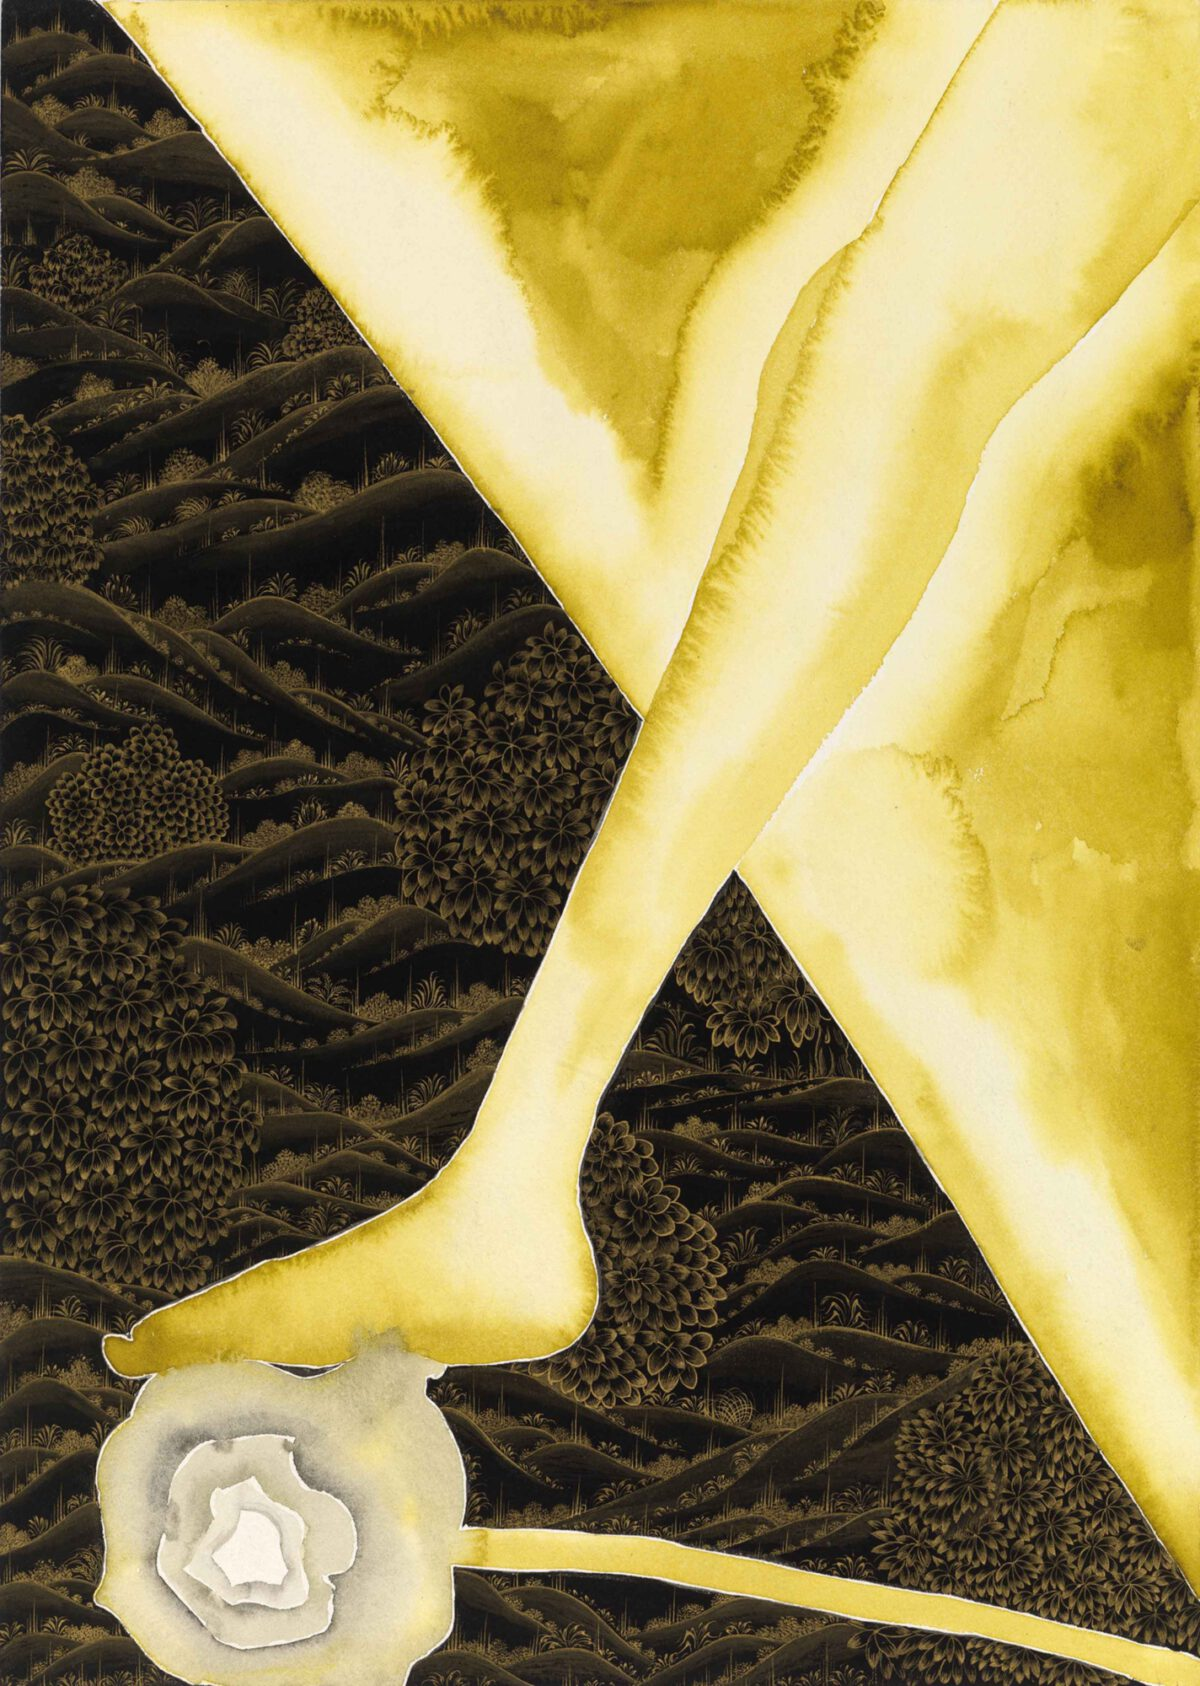 ee401a8d9 Francesco Clemente, Artist, Blain|Southern